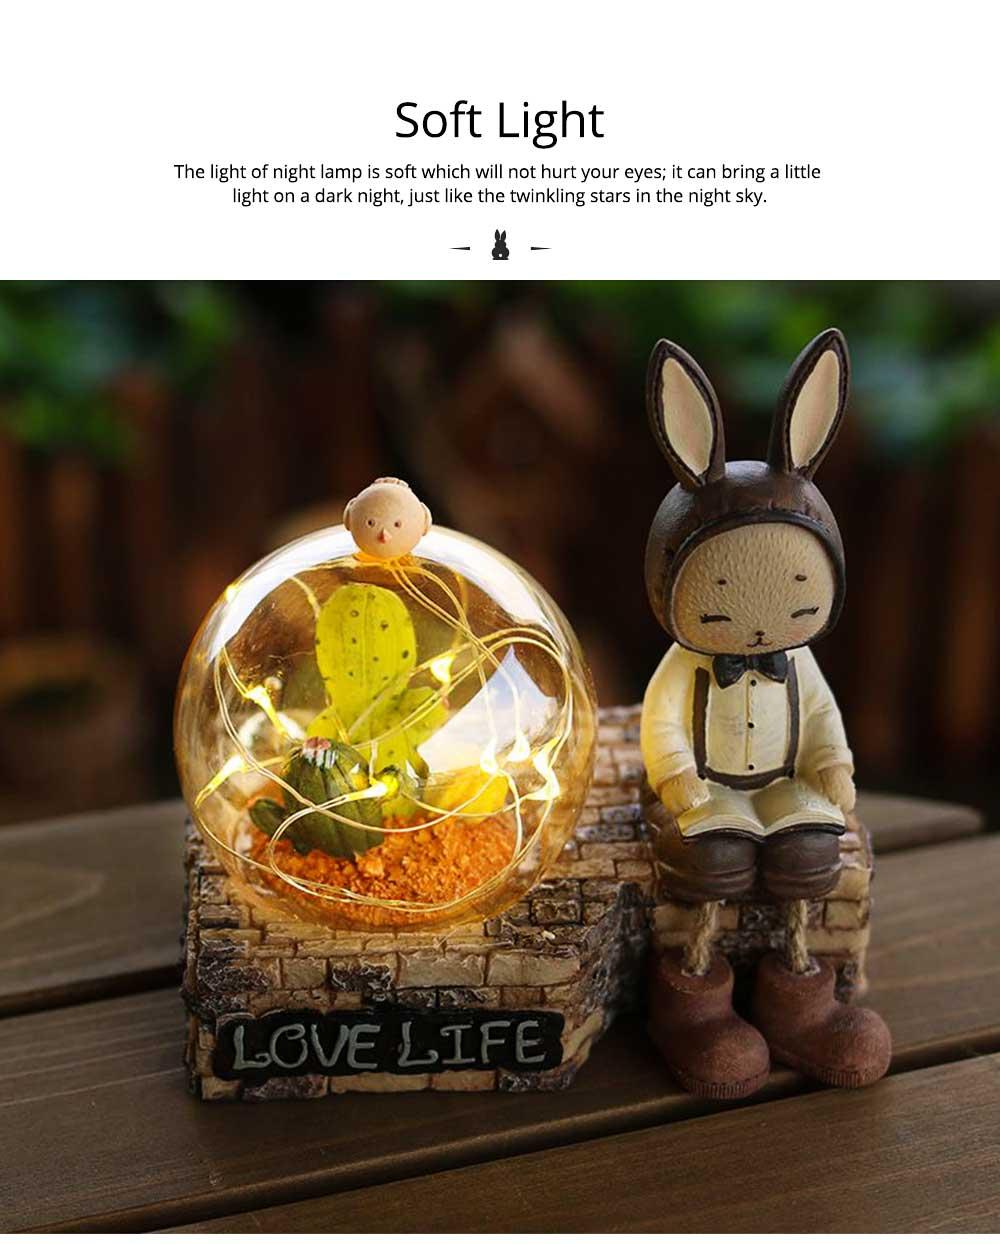 Creative Jenny Rabbit Toy Night Light, Decorative Table Lamp Birthday Gifts for Kids Baby Girls Boys 9